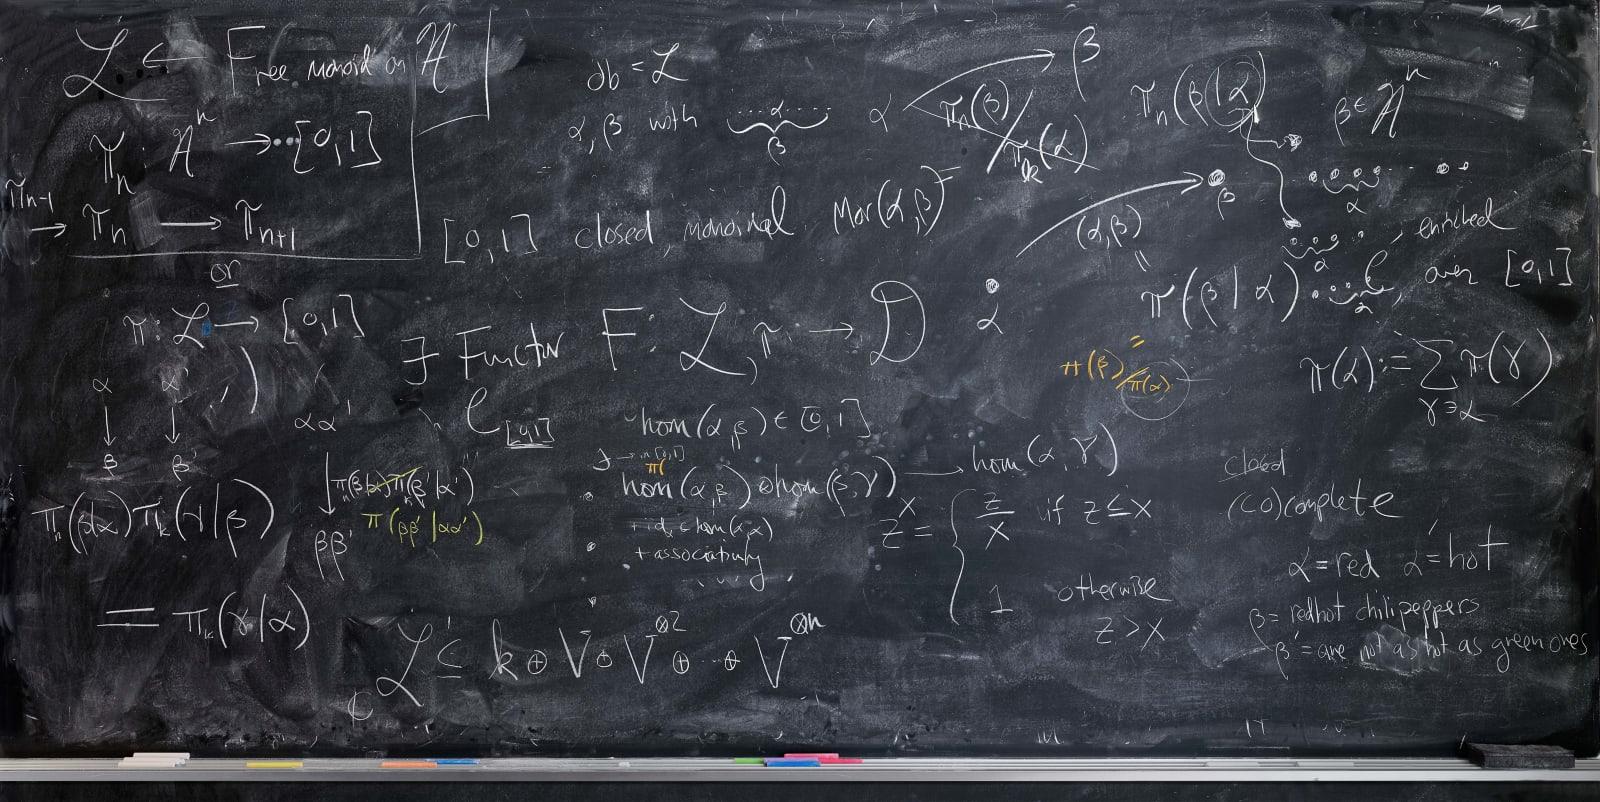 Jessica Wynne John Terilla blackboard with mathematical chalk drawings